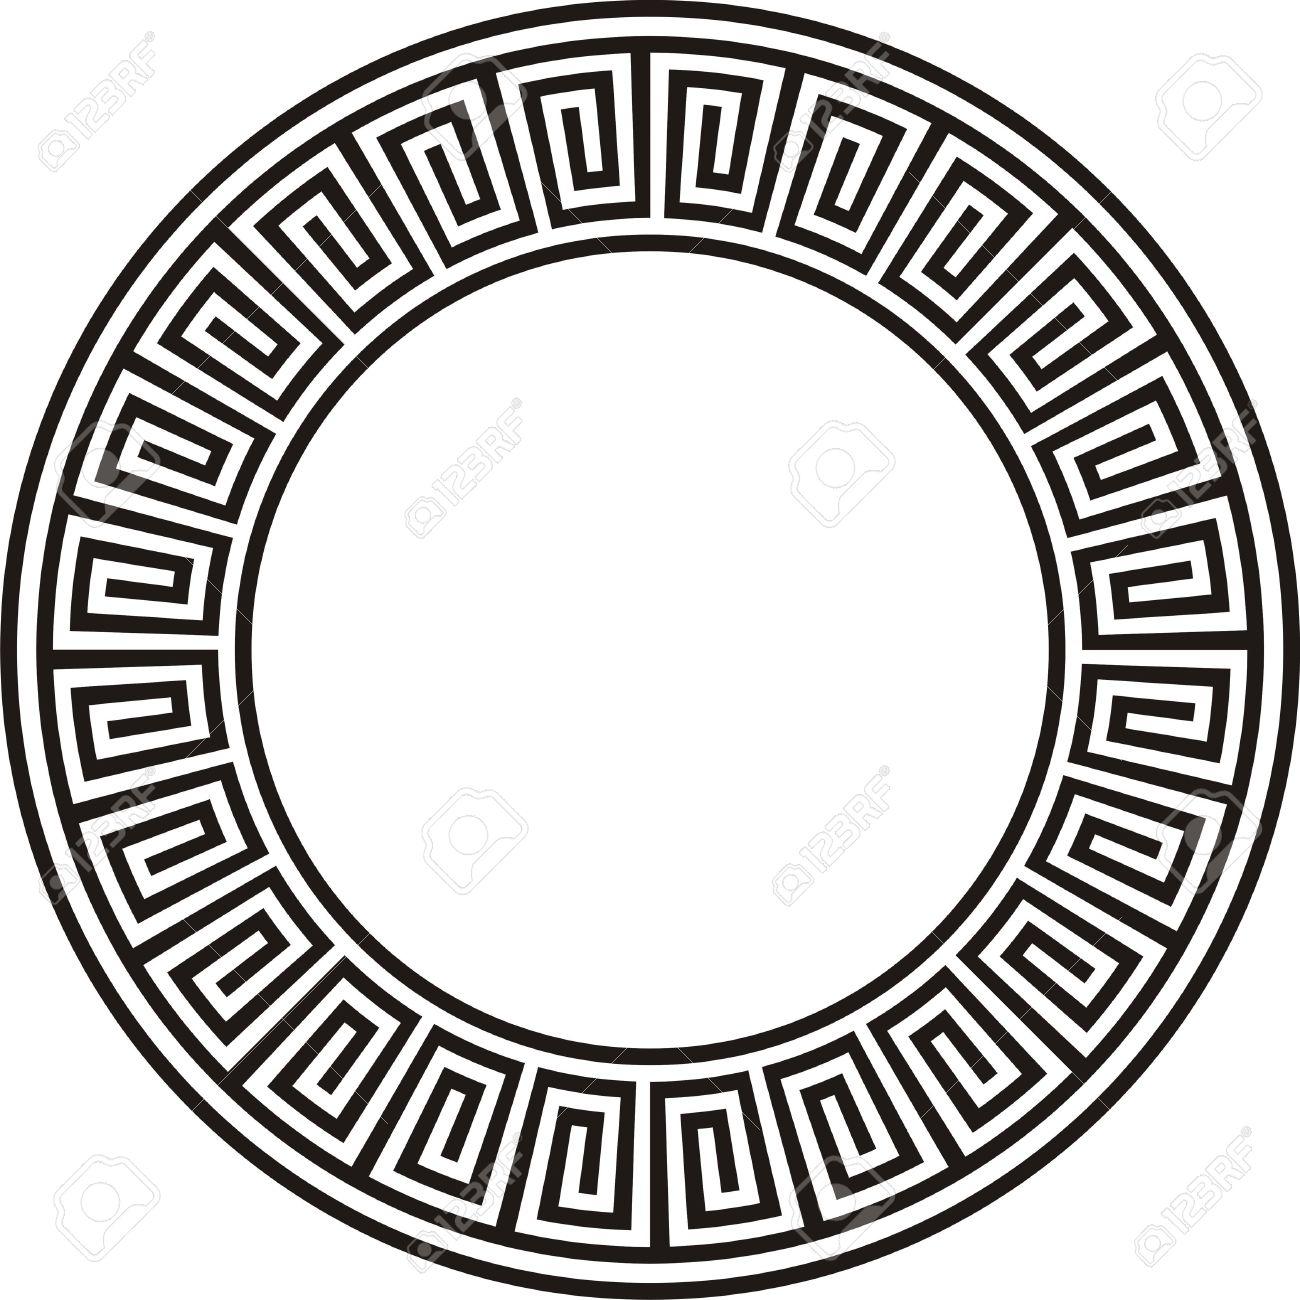 Ancient circular aztec design in black and white stock photo ancient circular aztec design in black and white stock photo 43127544 buycottarizona Gallery